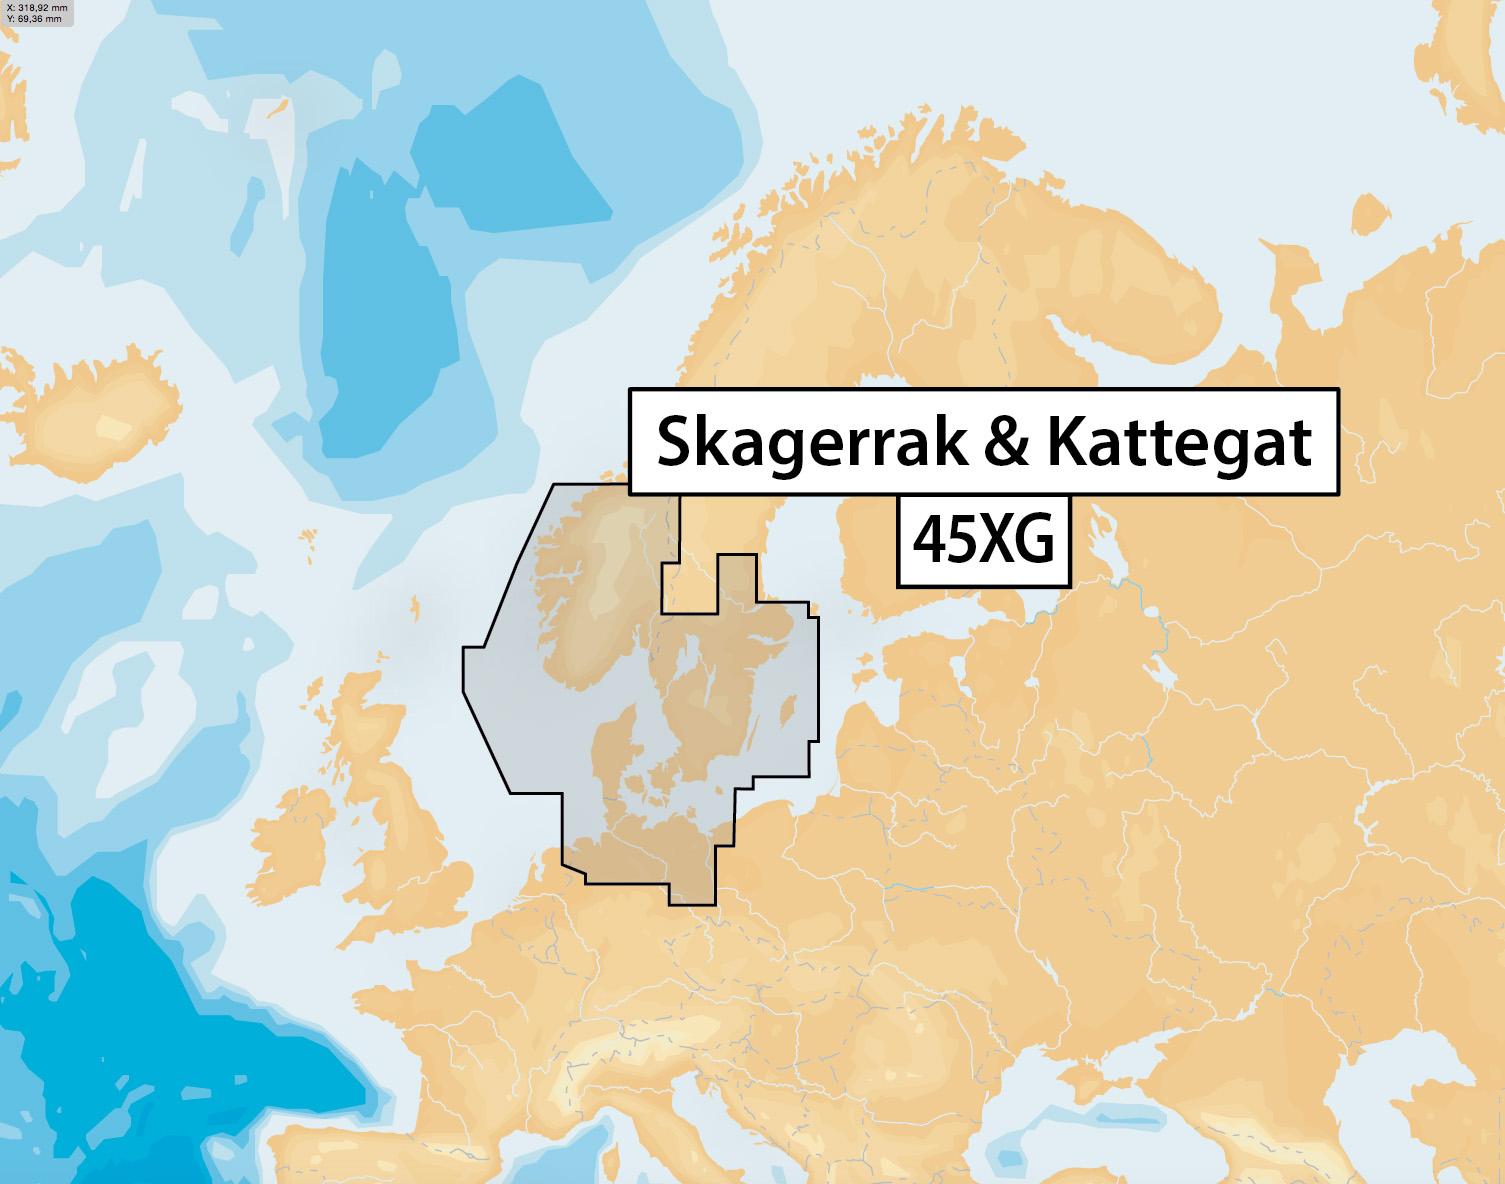 Navionics + Plus Preloaded Seekartenmodul mSD/SD Karte 45XG Skagerrak und Kattegat